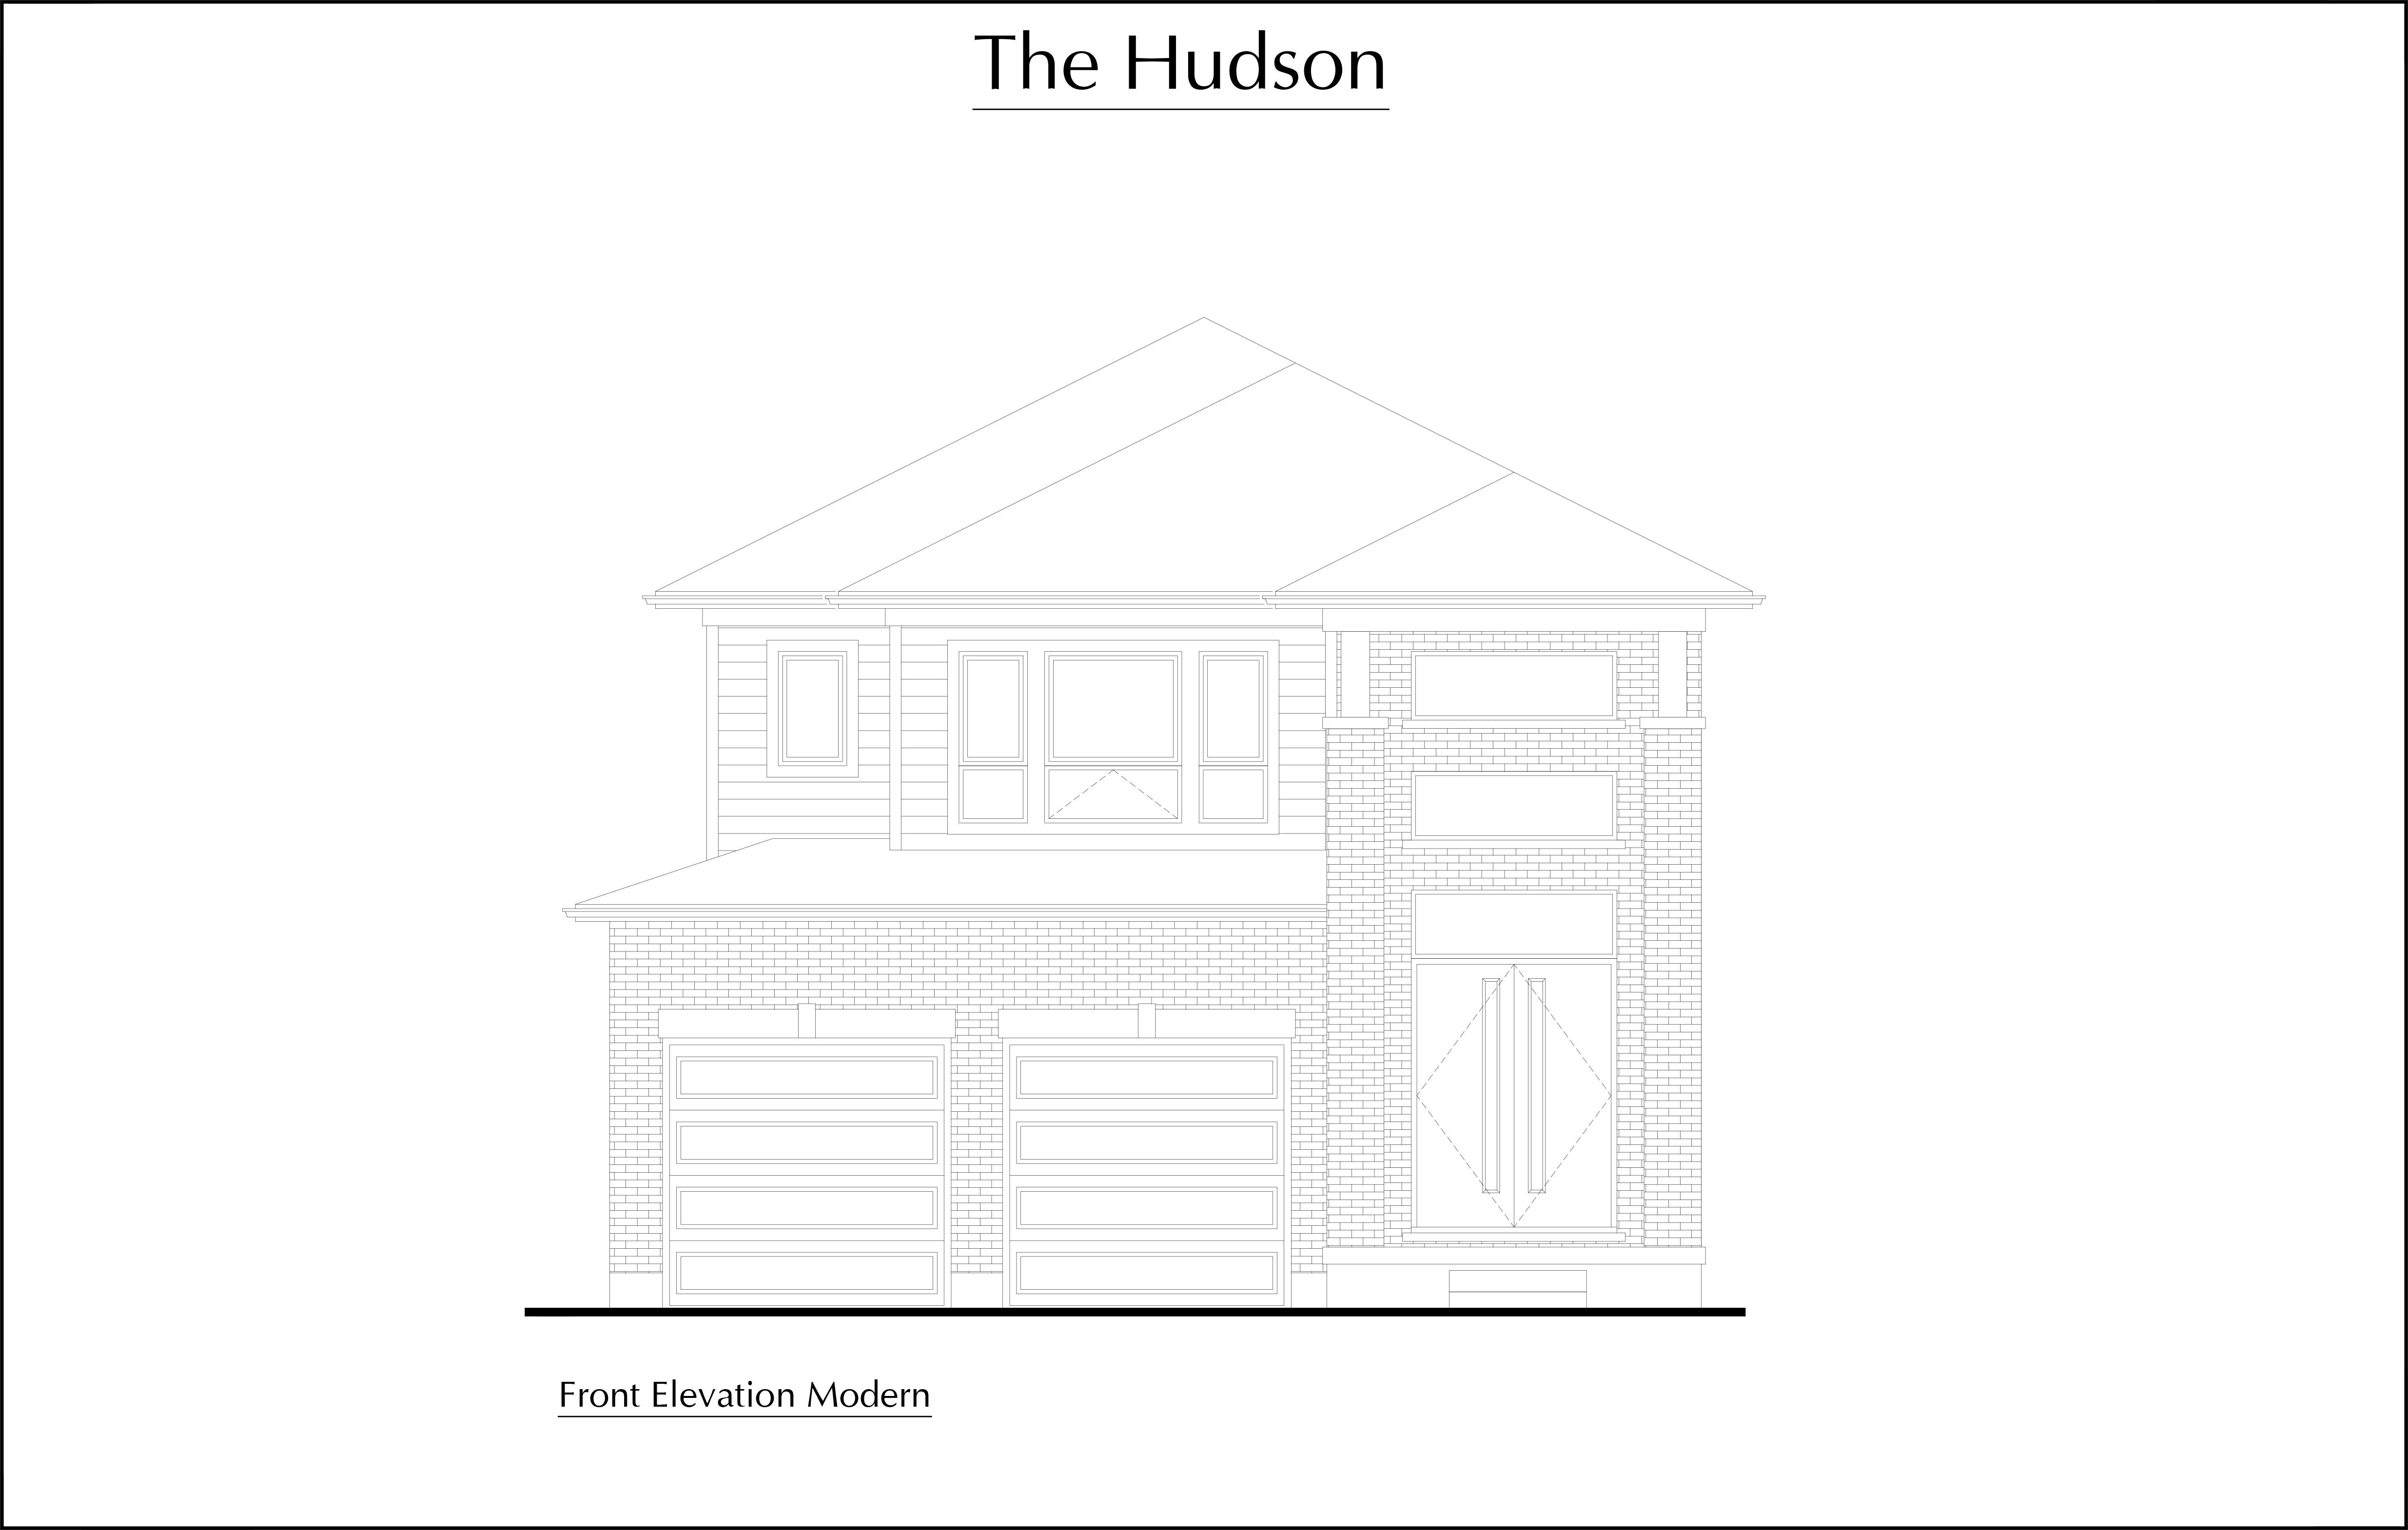 HUDSON-FRONT-MODERN